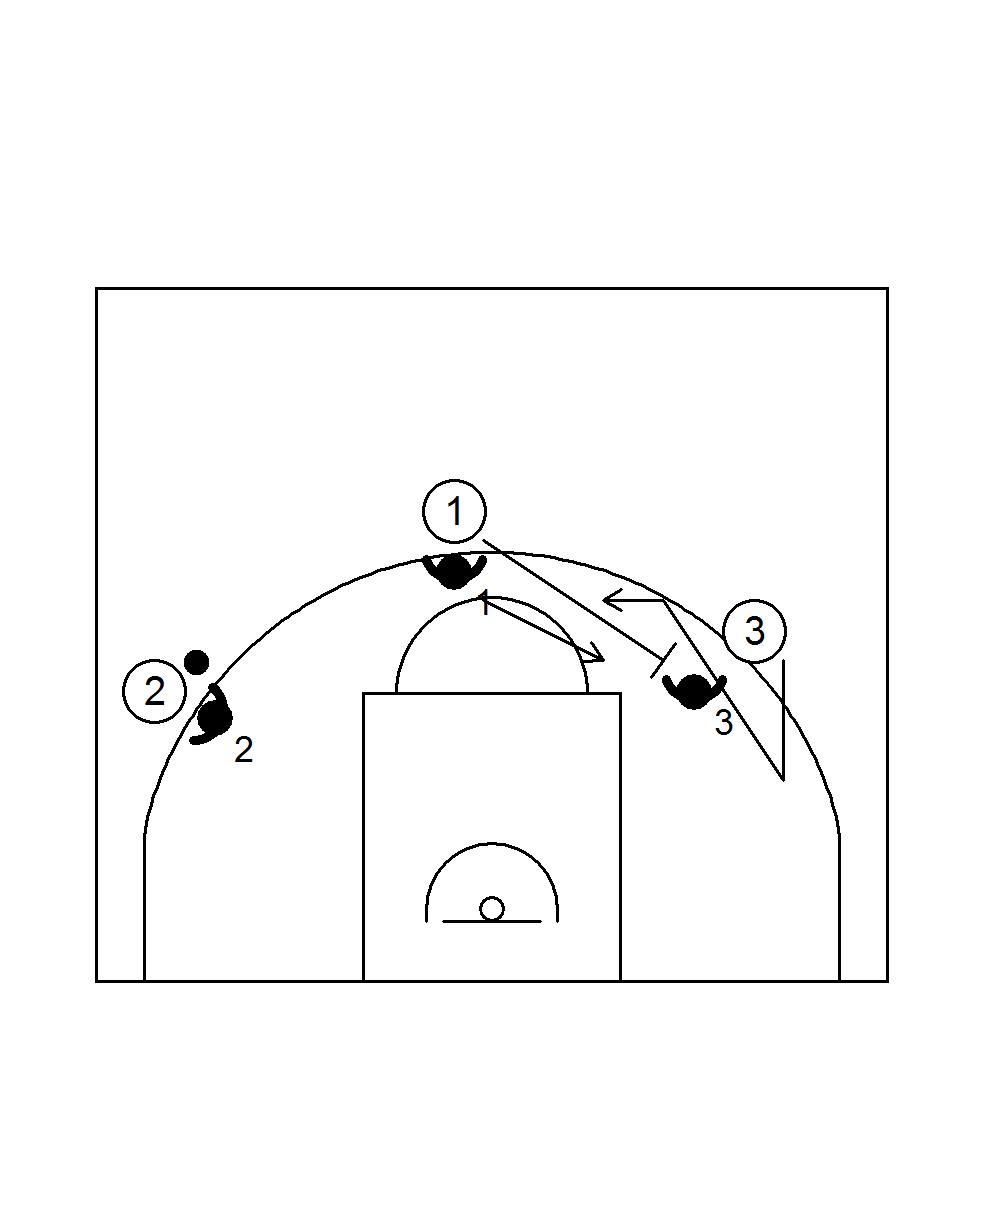 motion-3-on-3-perimeter